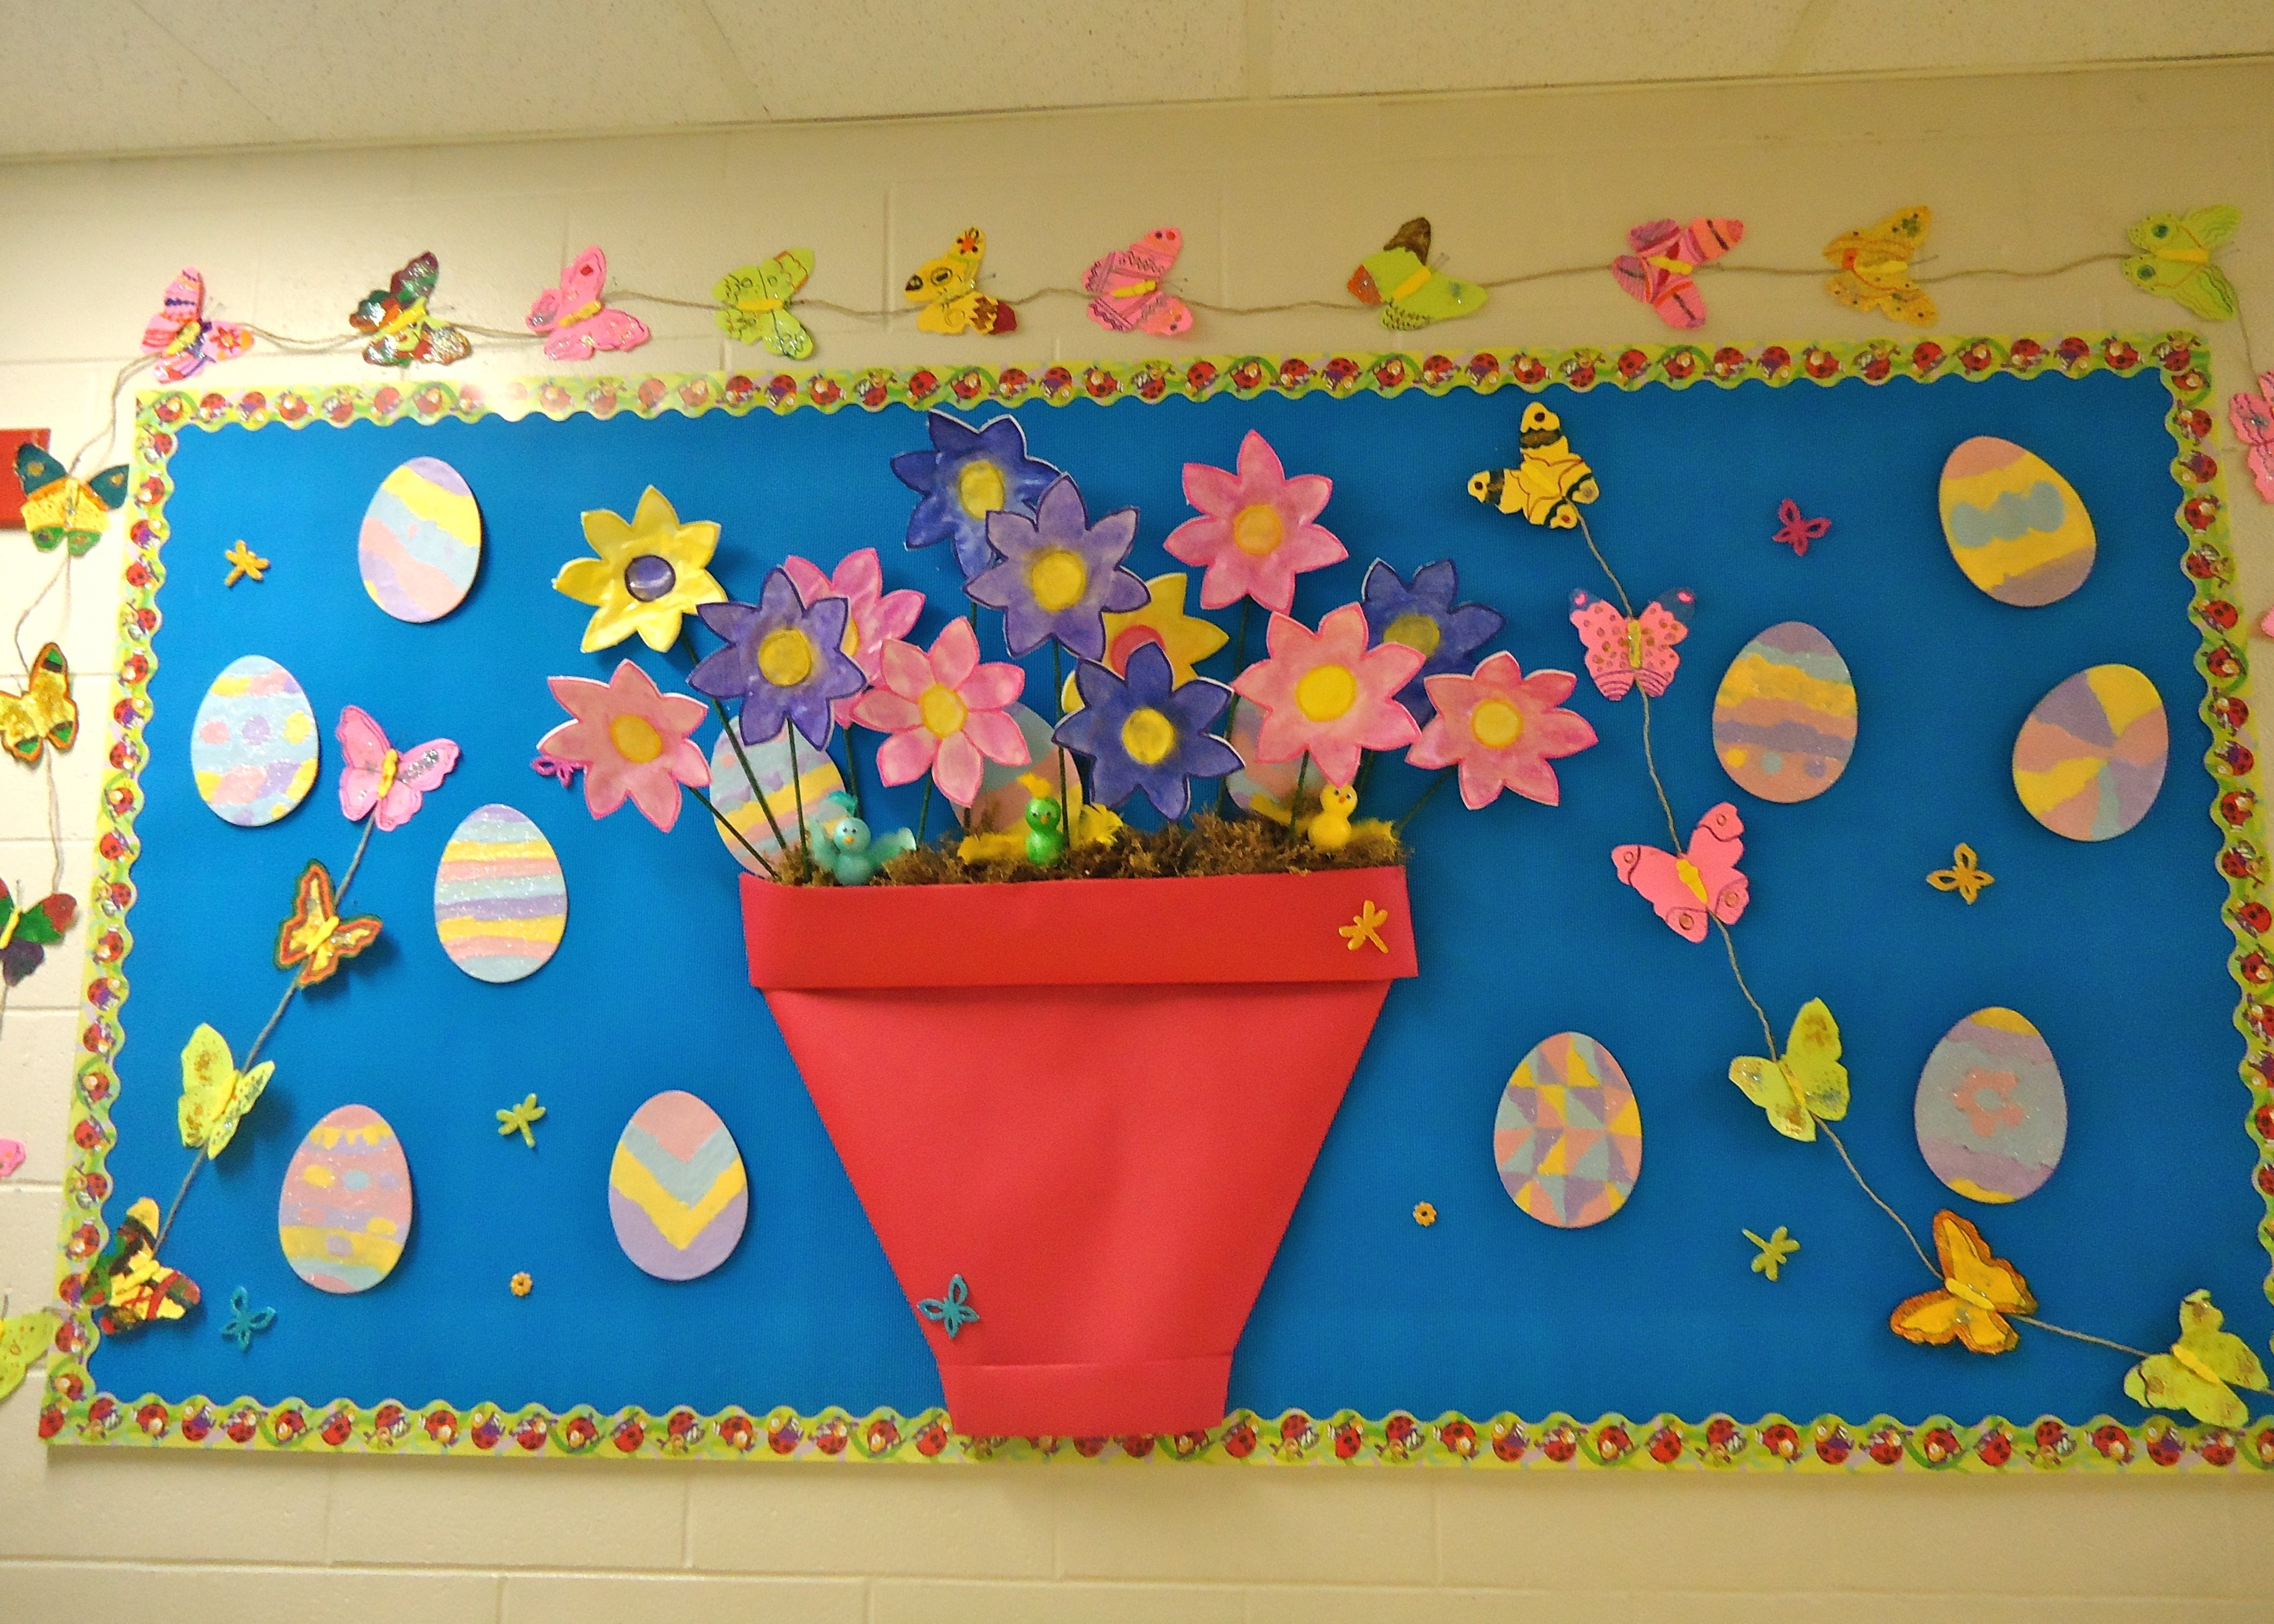 10 Attractive Spring Bulletin Board Ideas Preschool spring bulletin board ideas for preschool classroom spring 2 2021